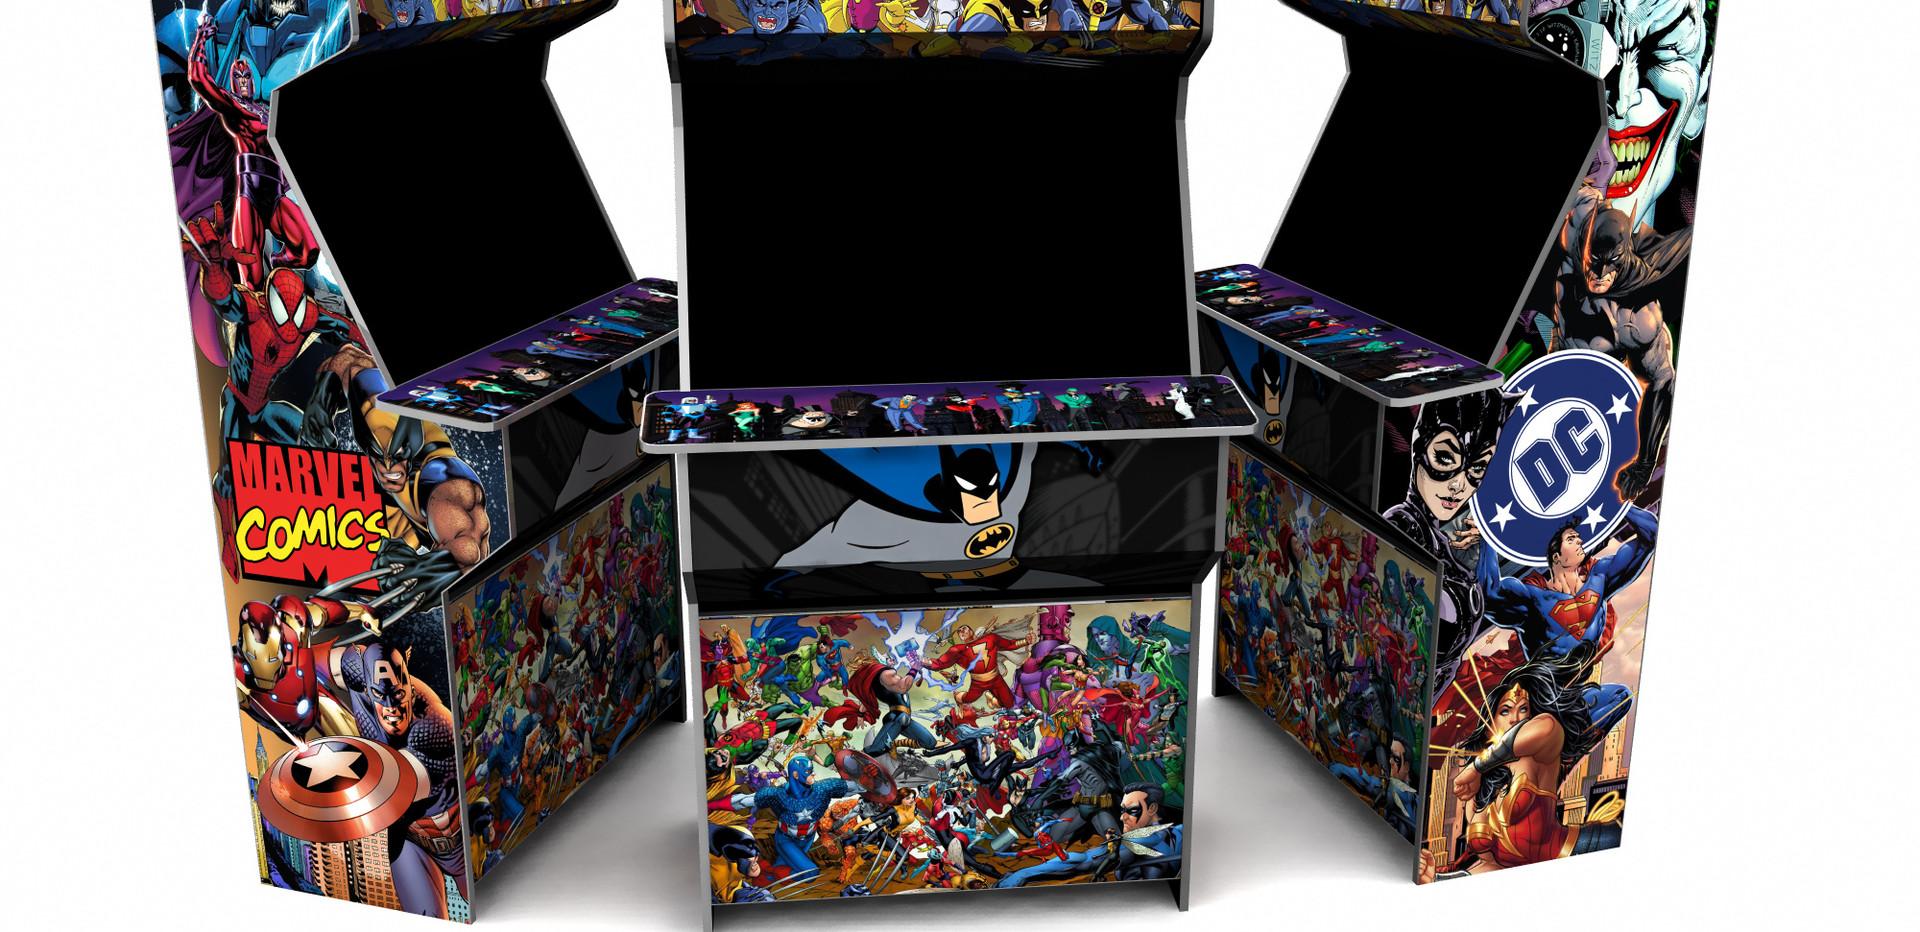 Marvel DC Arcade